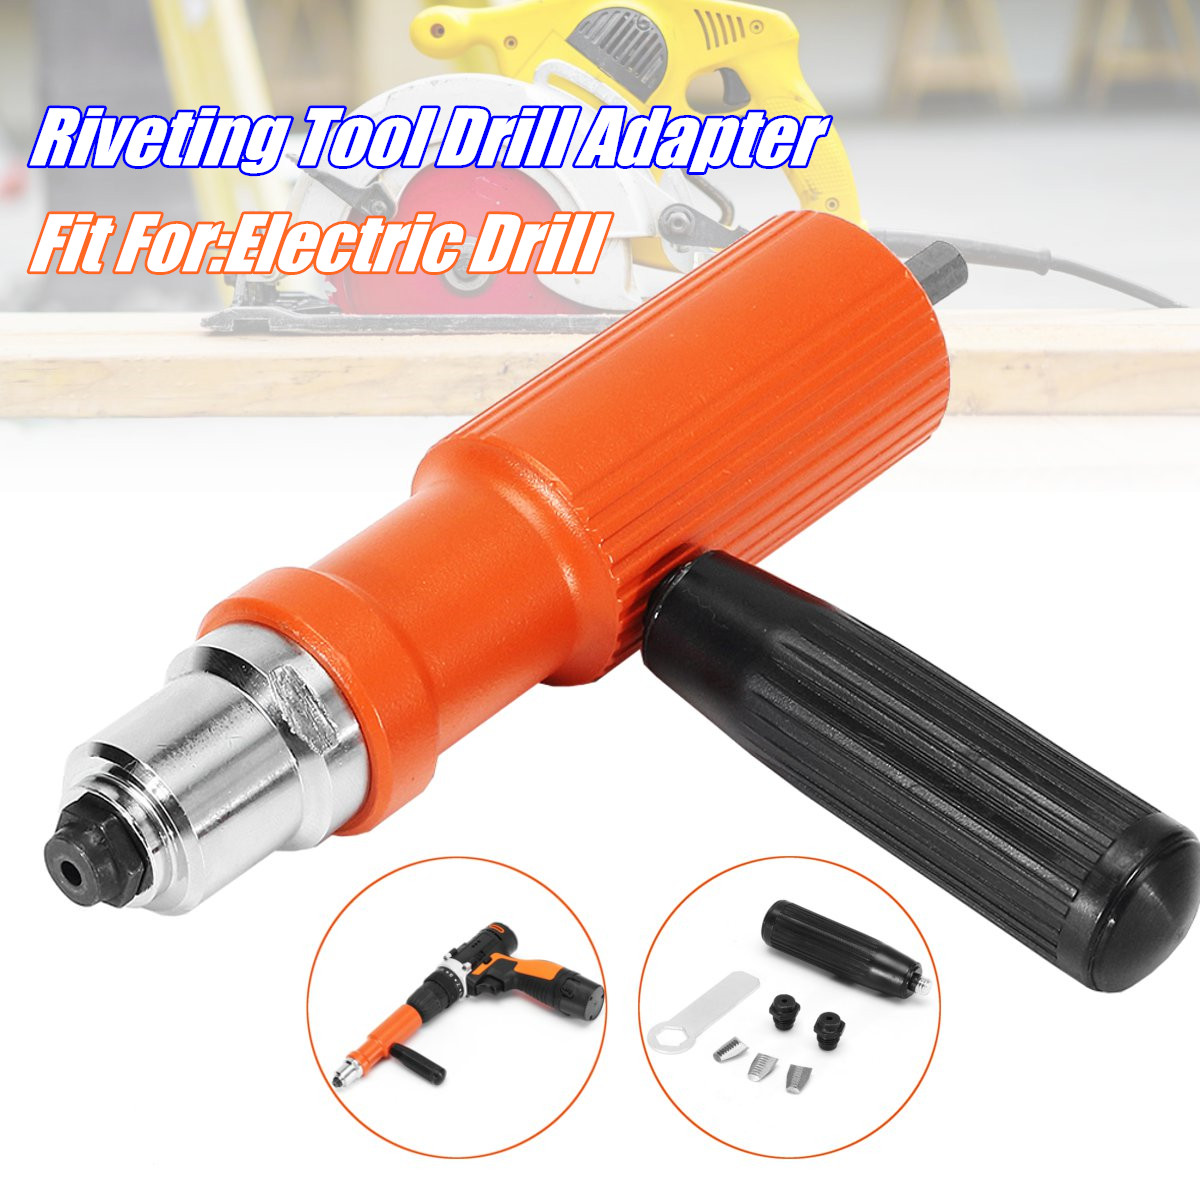 Drillpro Riveting Tool Drill Adapter Upgraded Electric Rivet Nut Gun Cordless Riveter Adaptor for Electric Drill Nibbler